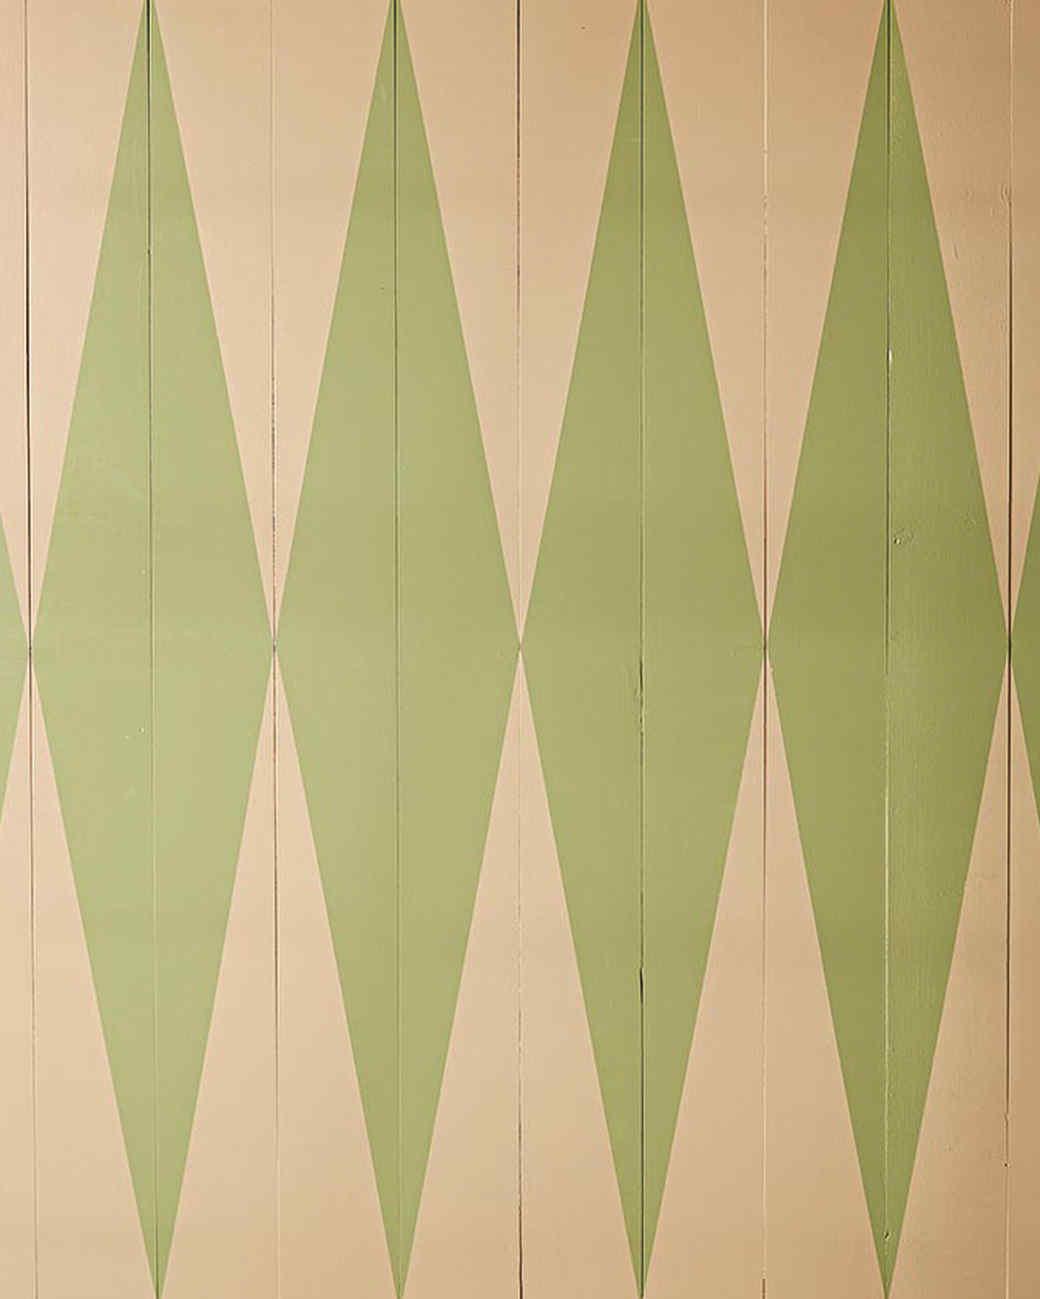 striped-floor-3-186-d112909.jpg